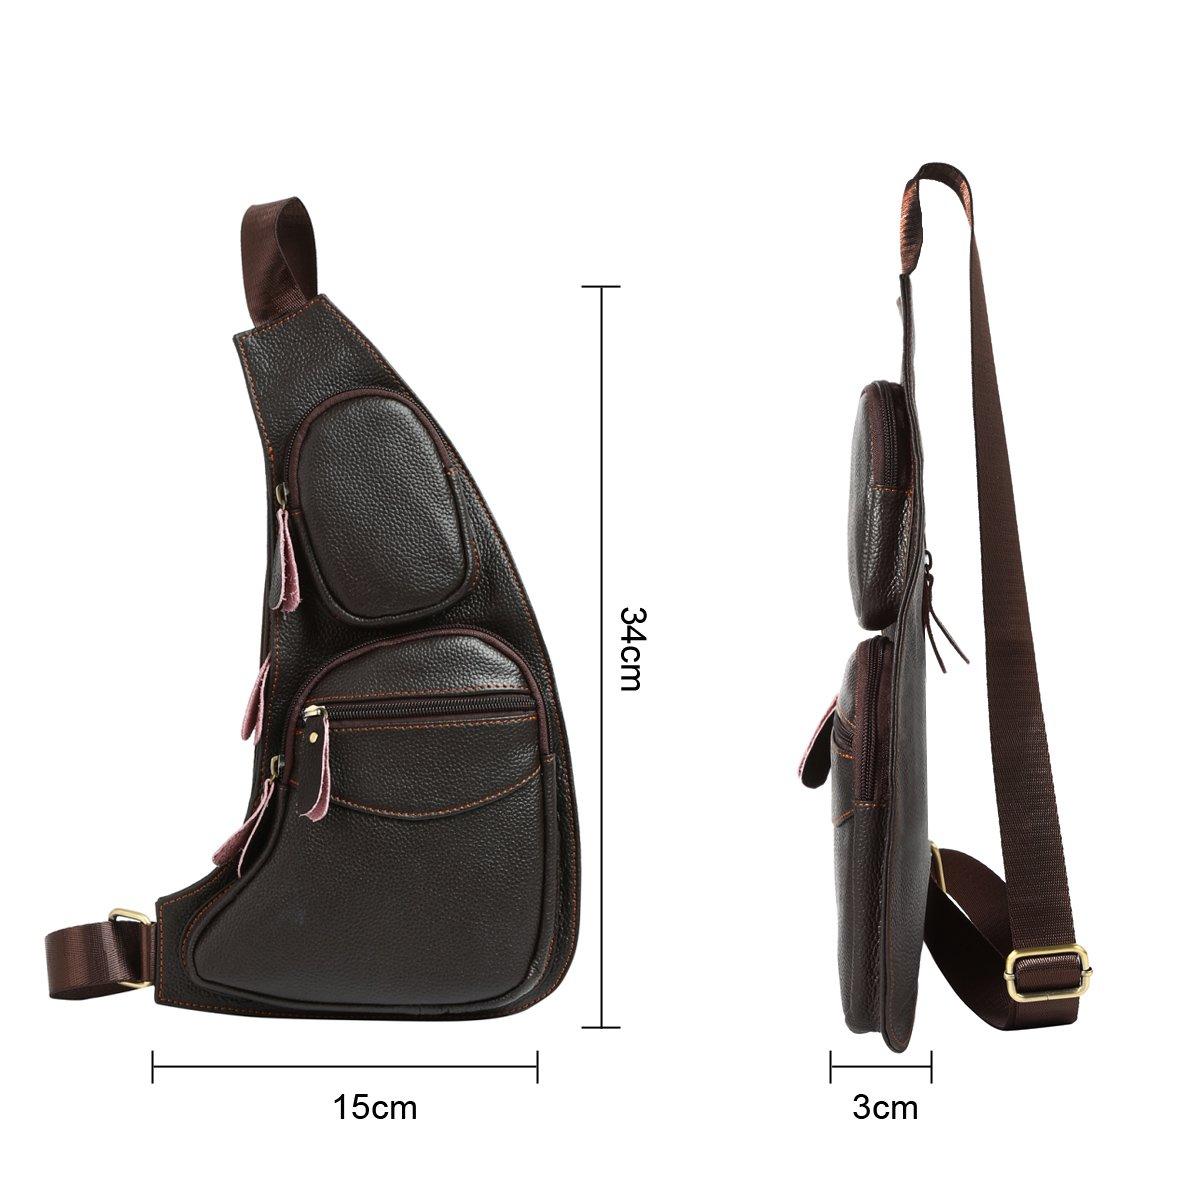 Amazon.com | Leathario Mens Leather Retro Chest Sling Crossbody Shoulder Bag Multipurpose Backpack (Black2) | Casual Daypacks